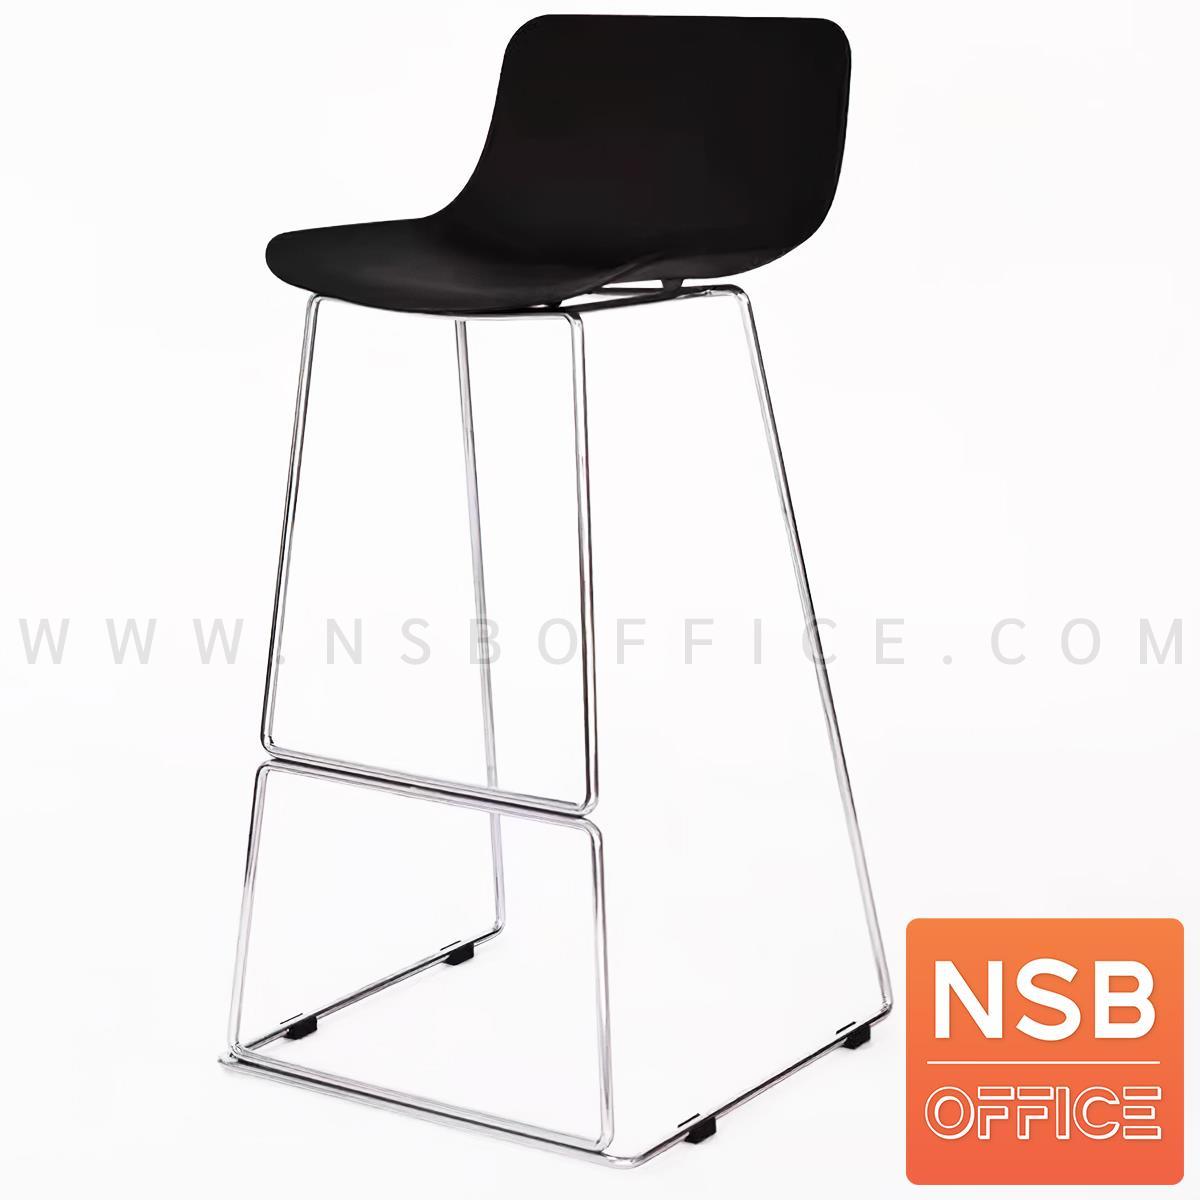 B18A091:เก้าอี้บาร์สูง รุ่น Jenetta (เจเนตต้า)  โครงขาเหล็กเพลาตันชุบโครเมี่ยม